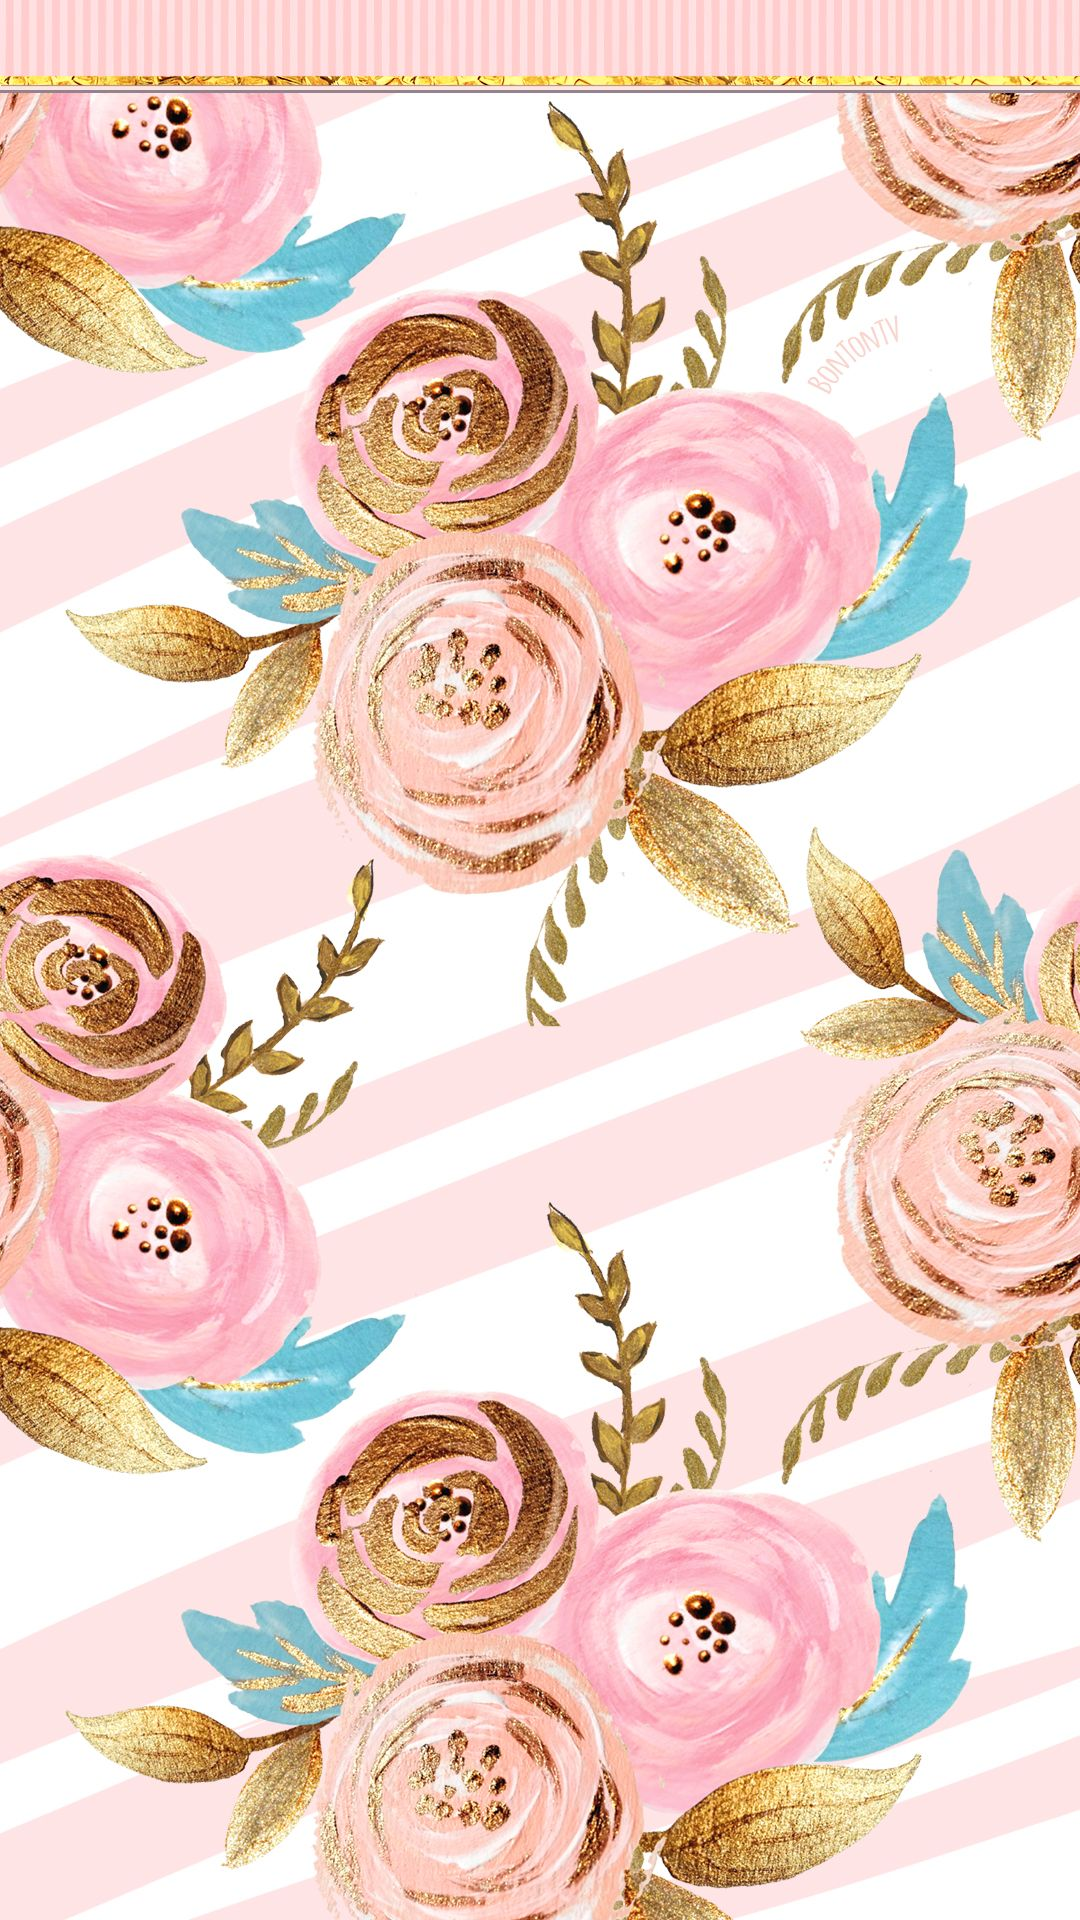 Phone Wallpapers Hd By Bonton Tv Free Download Pozadine Za Mobitel Telefon U Vi Gold Wallpaper Iphone Gold Wallpaper Background Flower Phone Wallpaper